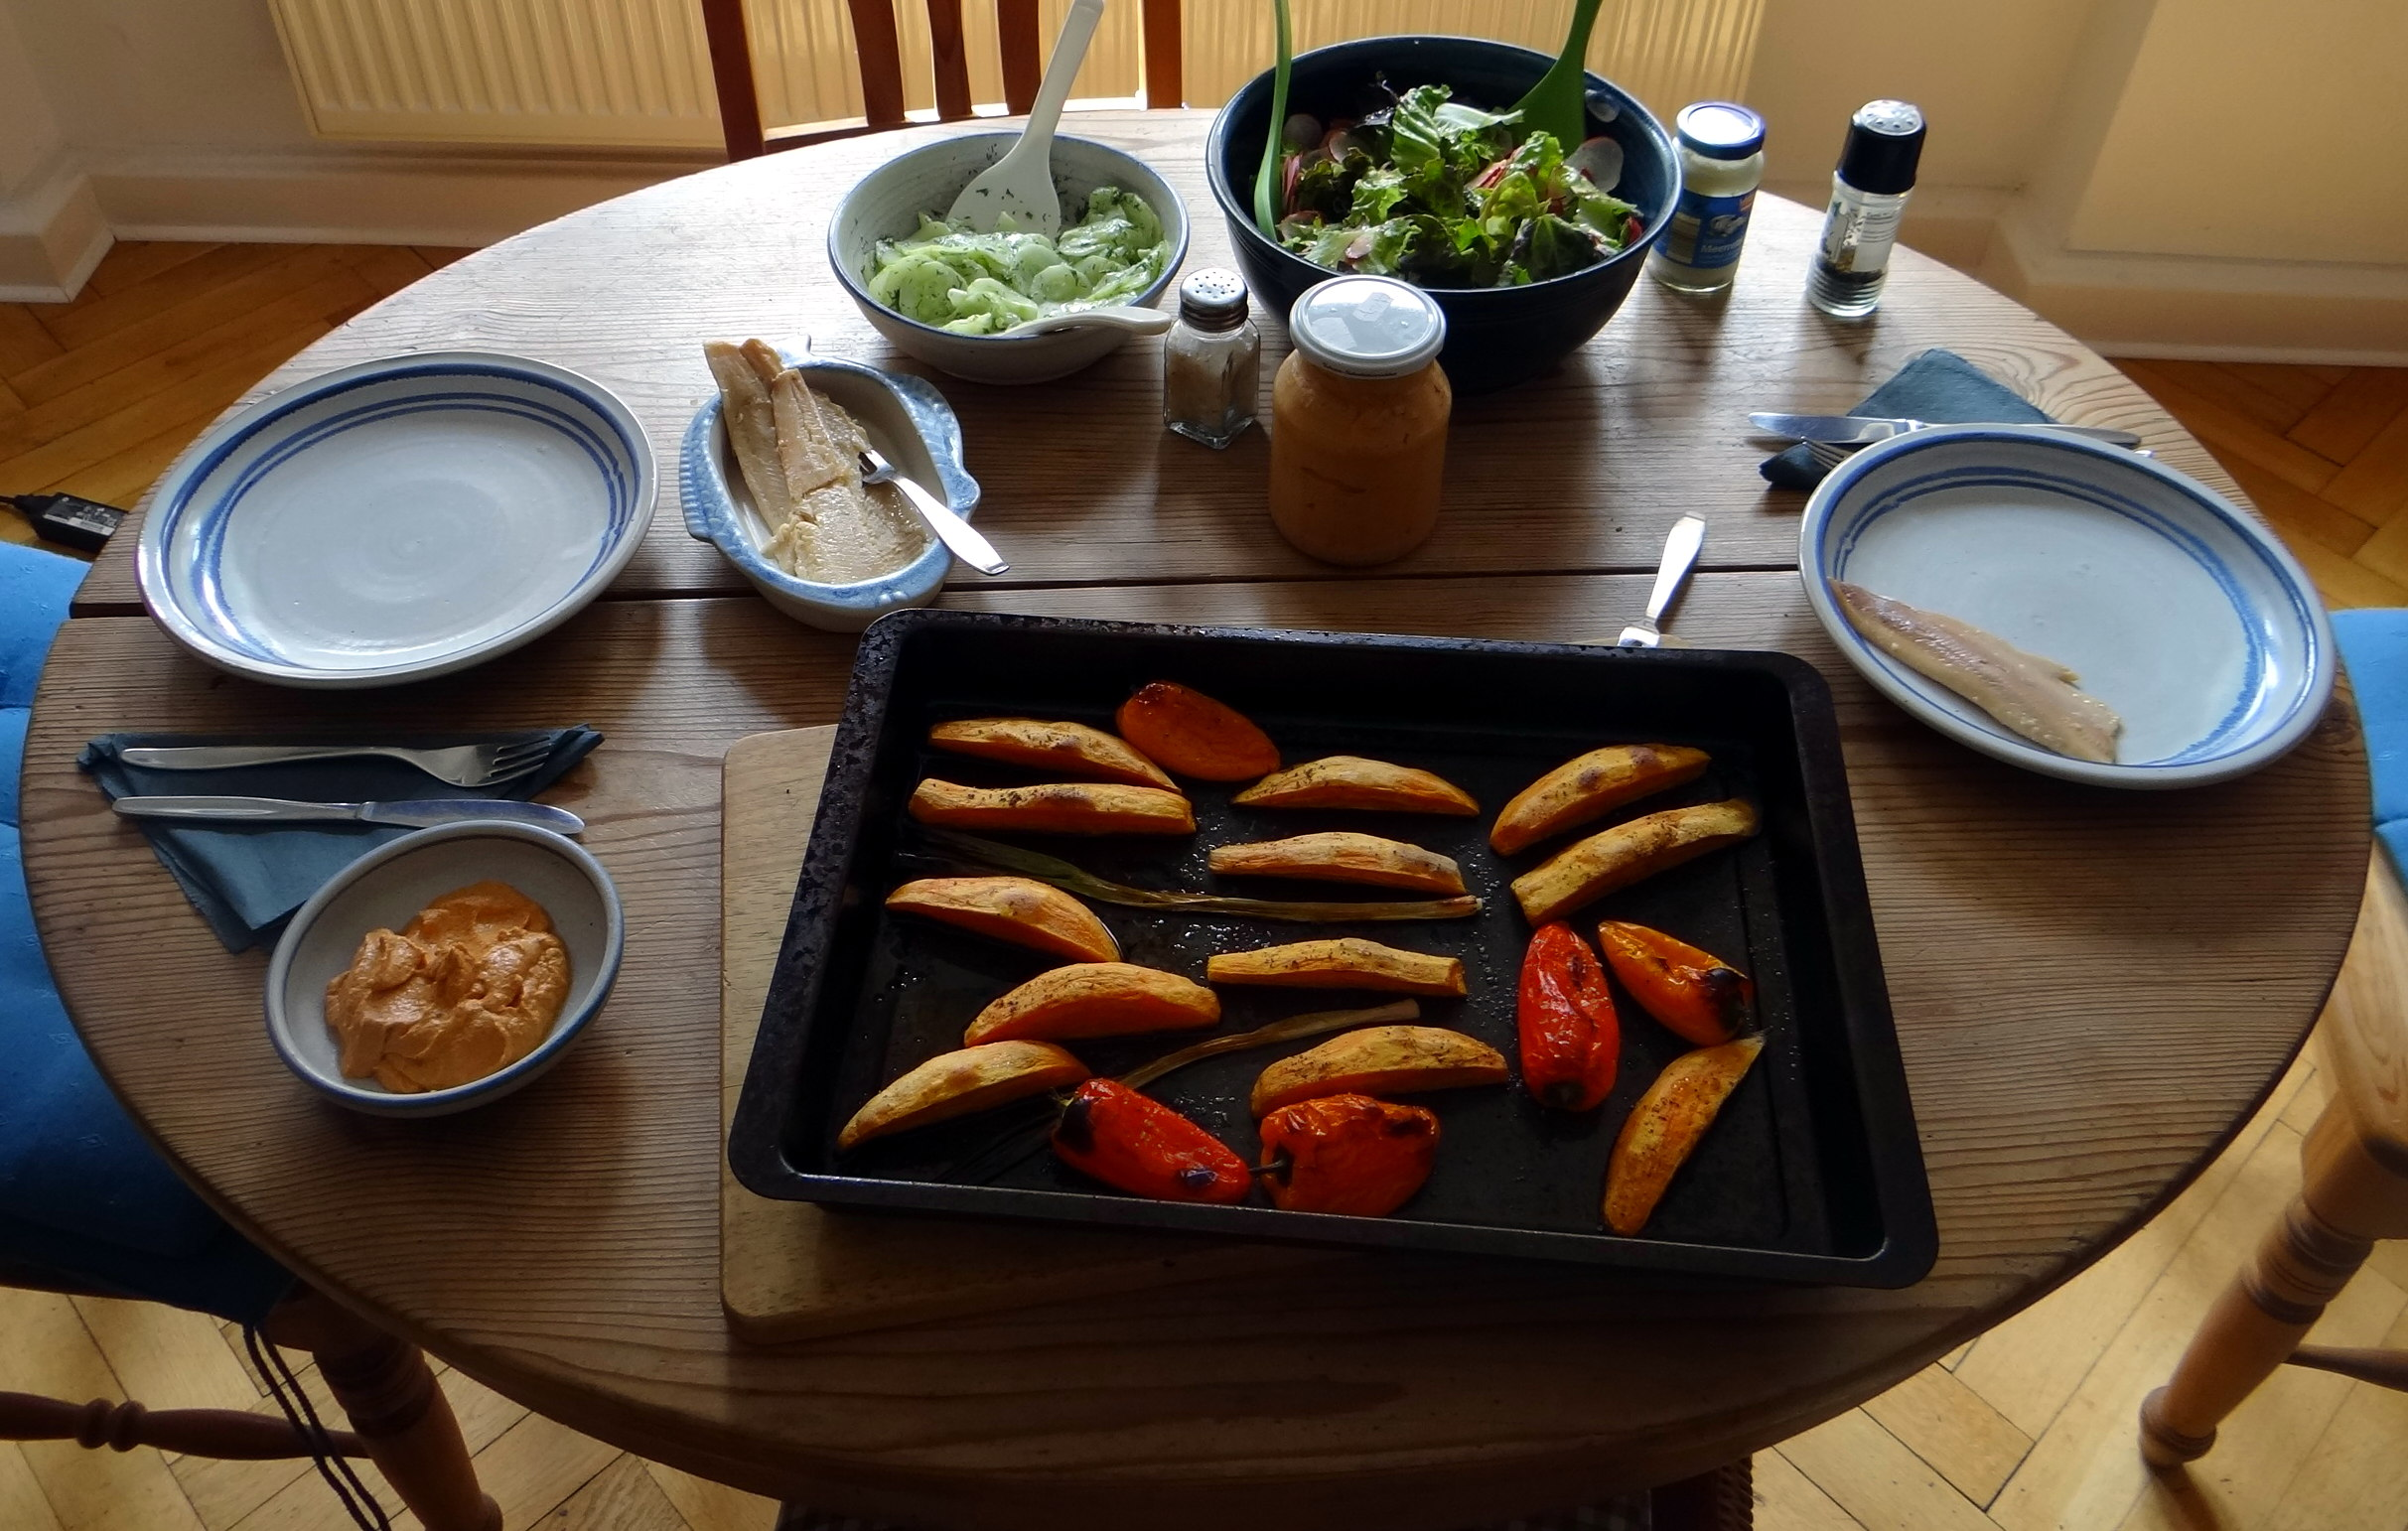 Süßkartoffel Spalten,Feta Creme,Salate (3)